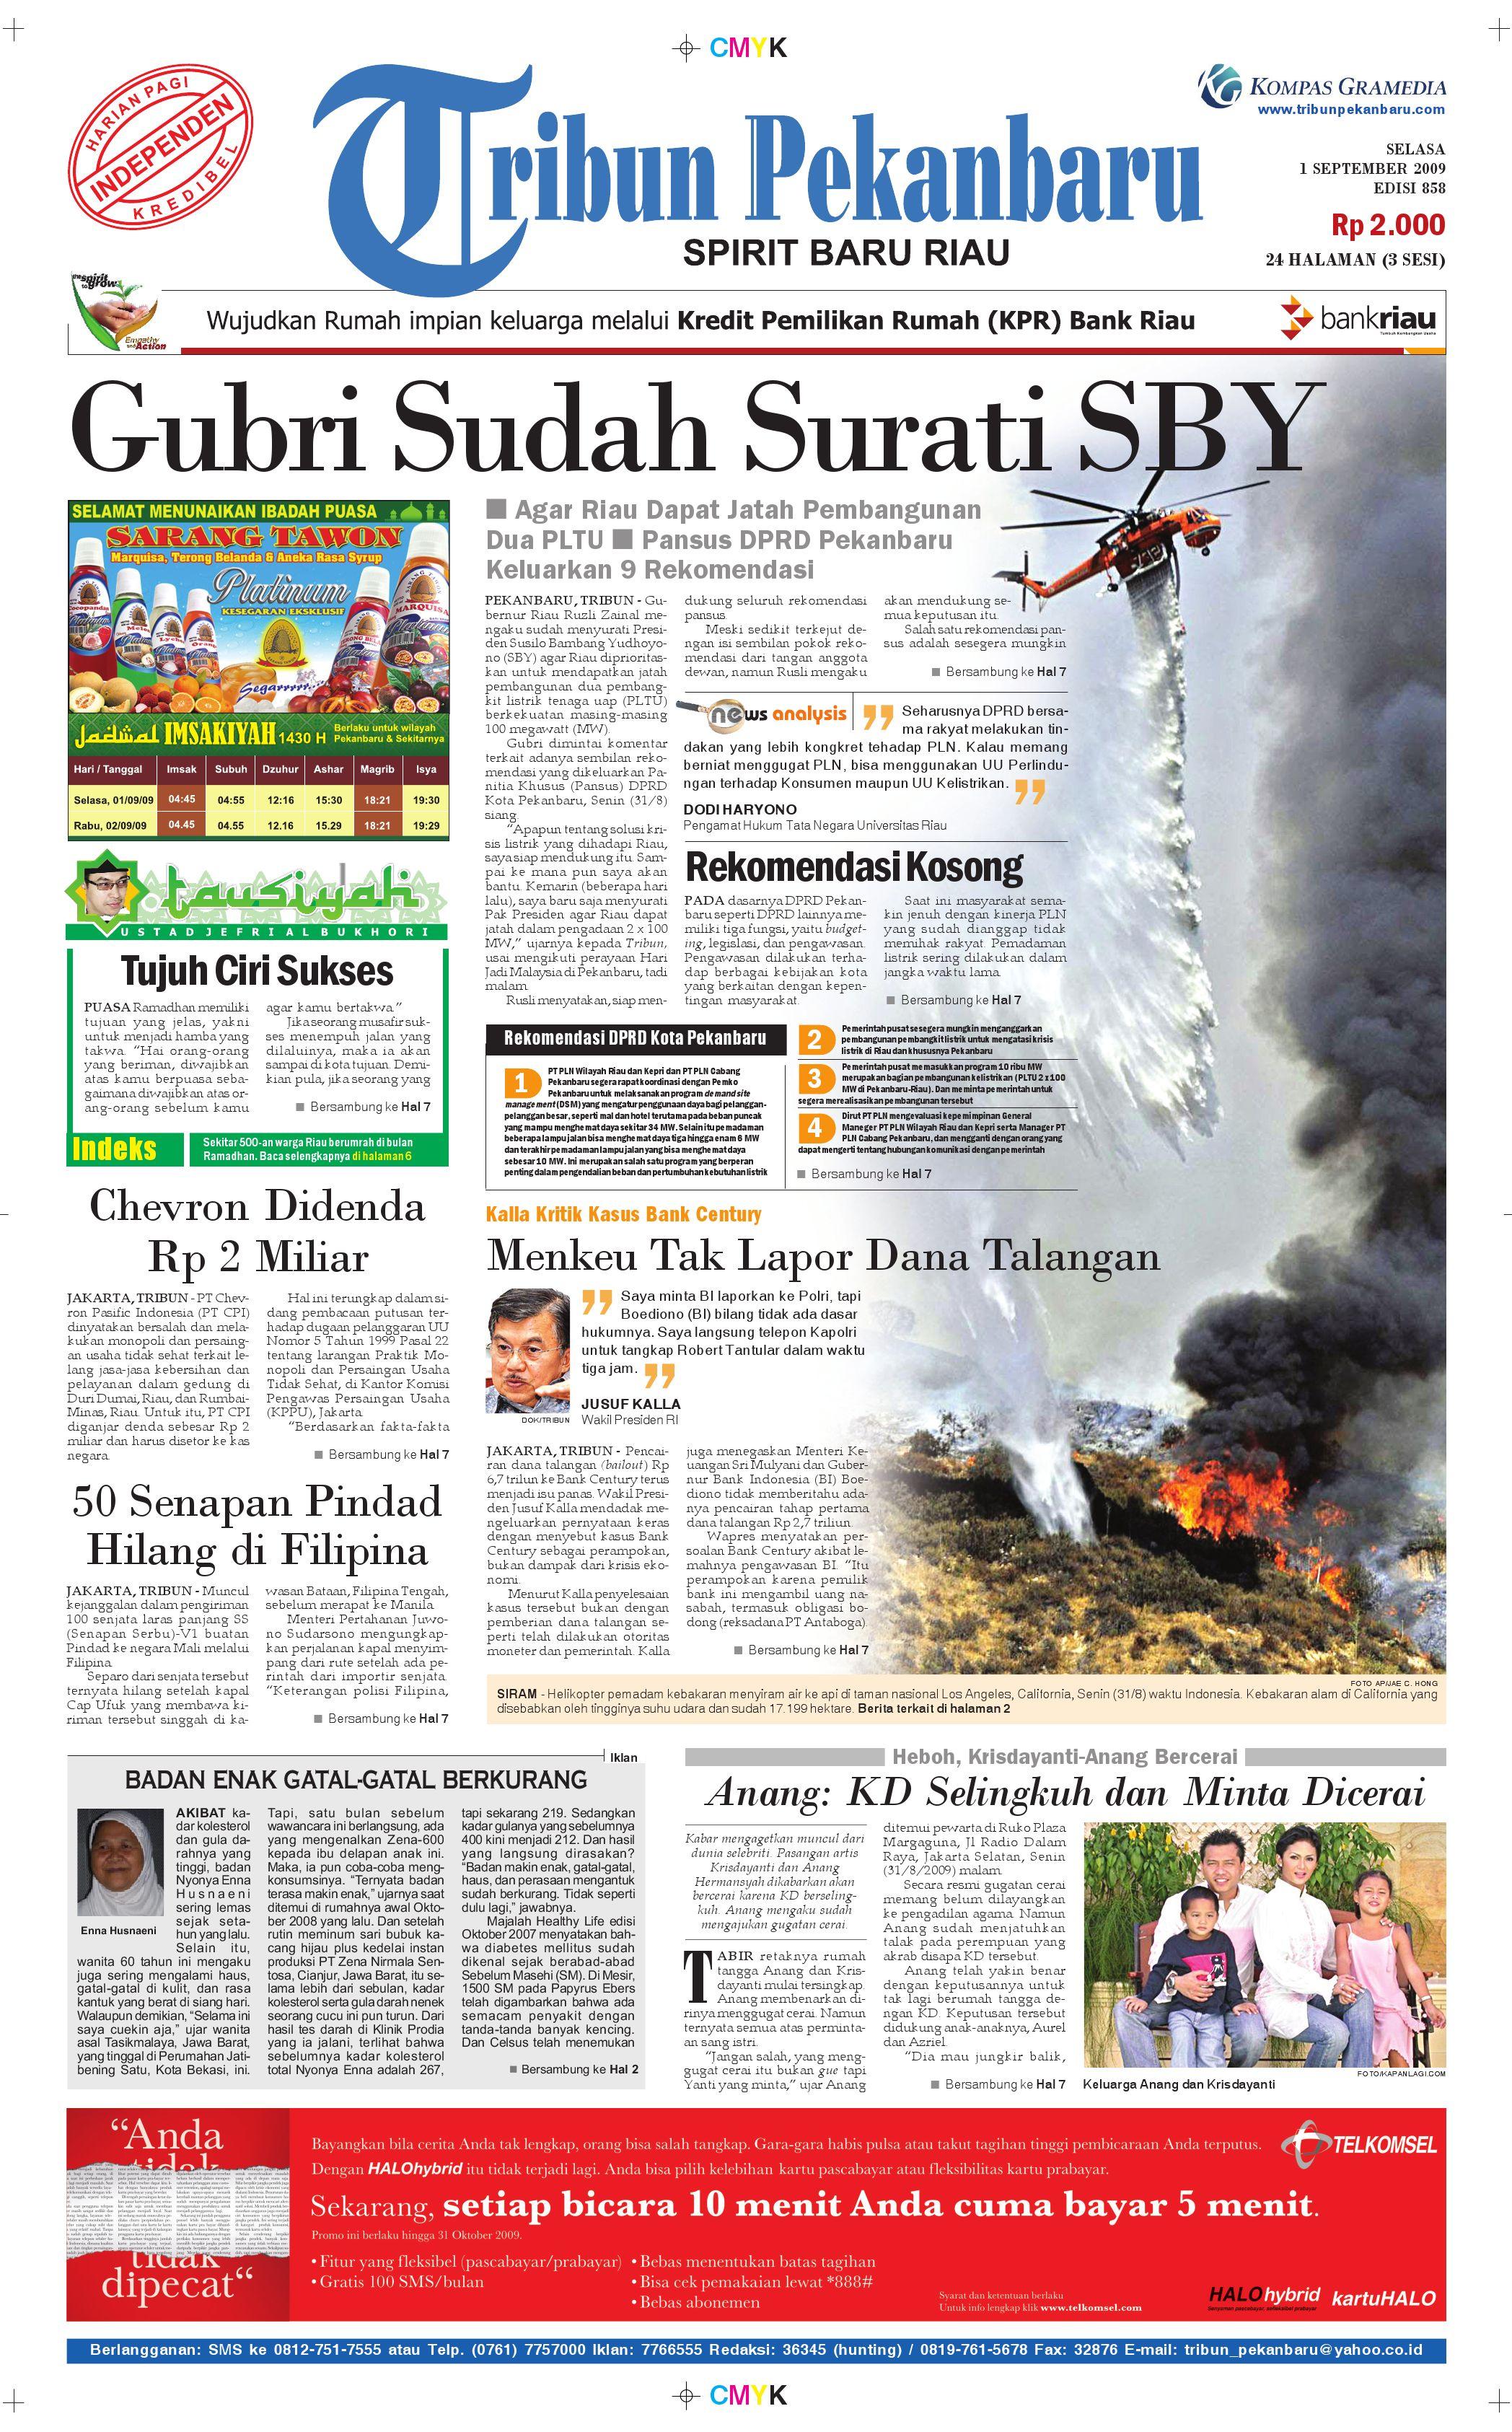 Epaper 01 September 2009 by dino zulfikardi - issuu aba94955af